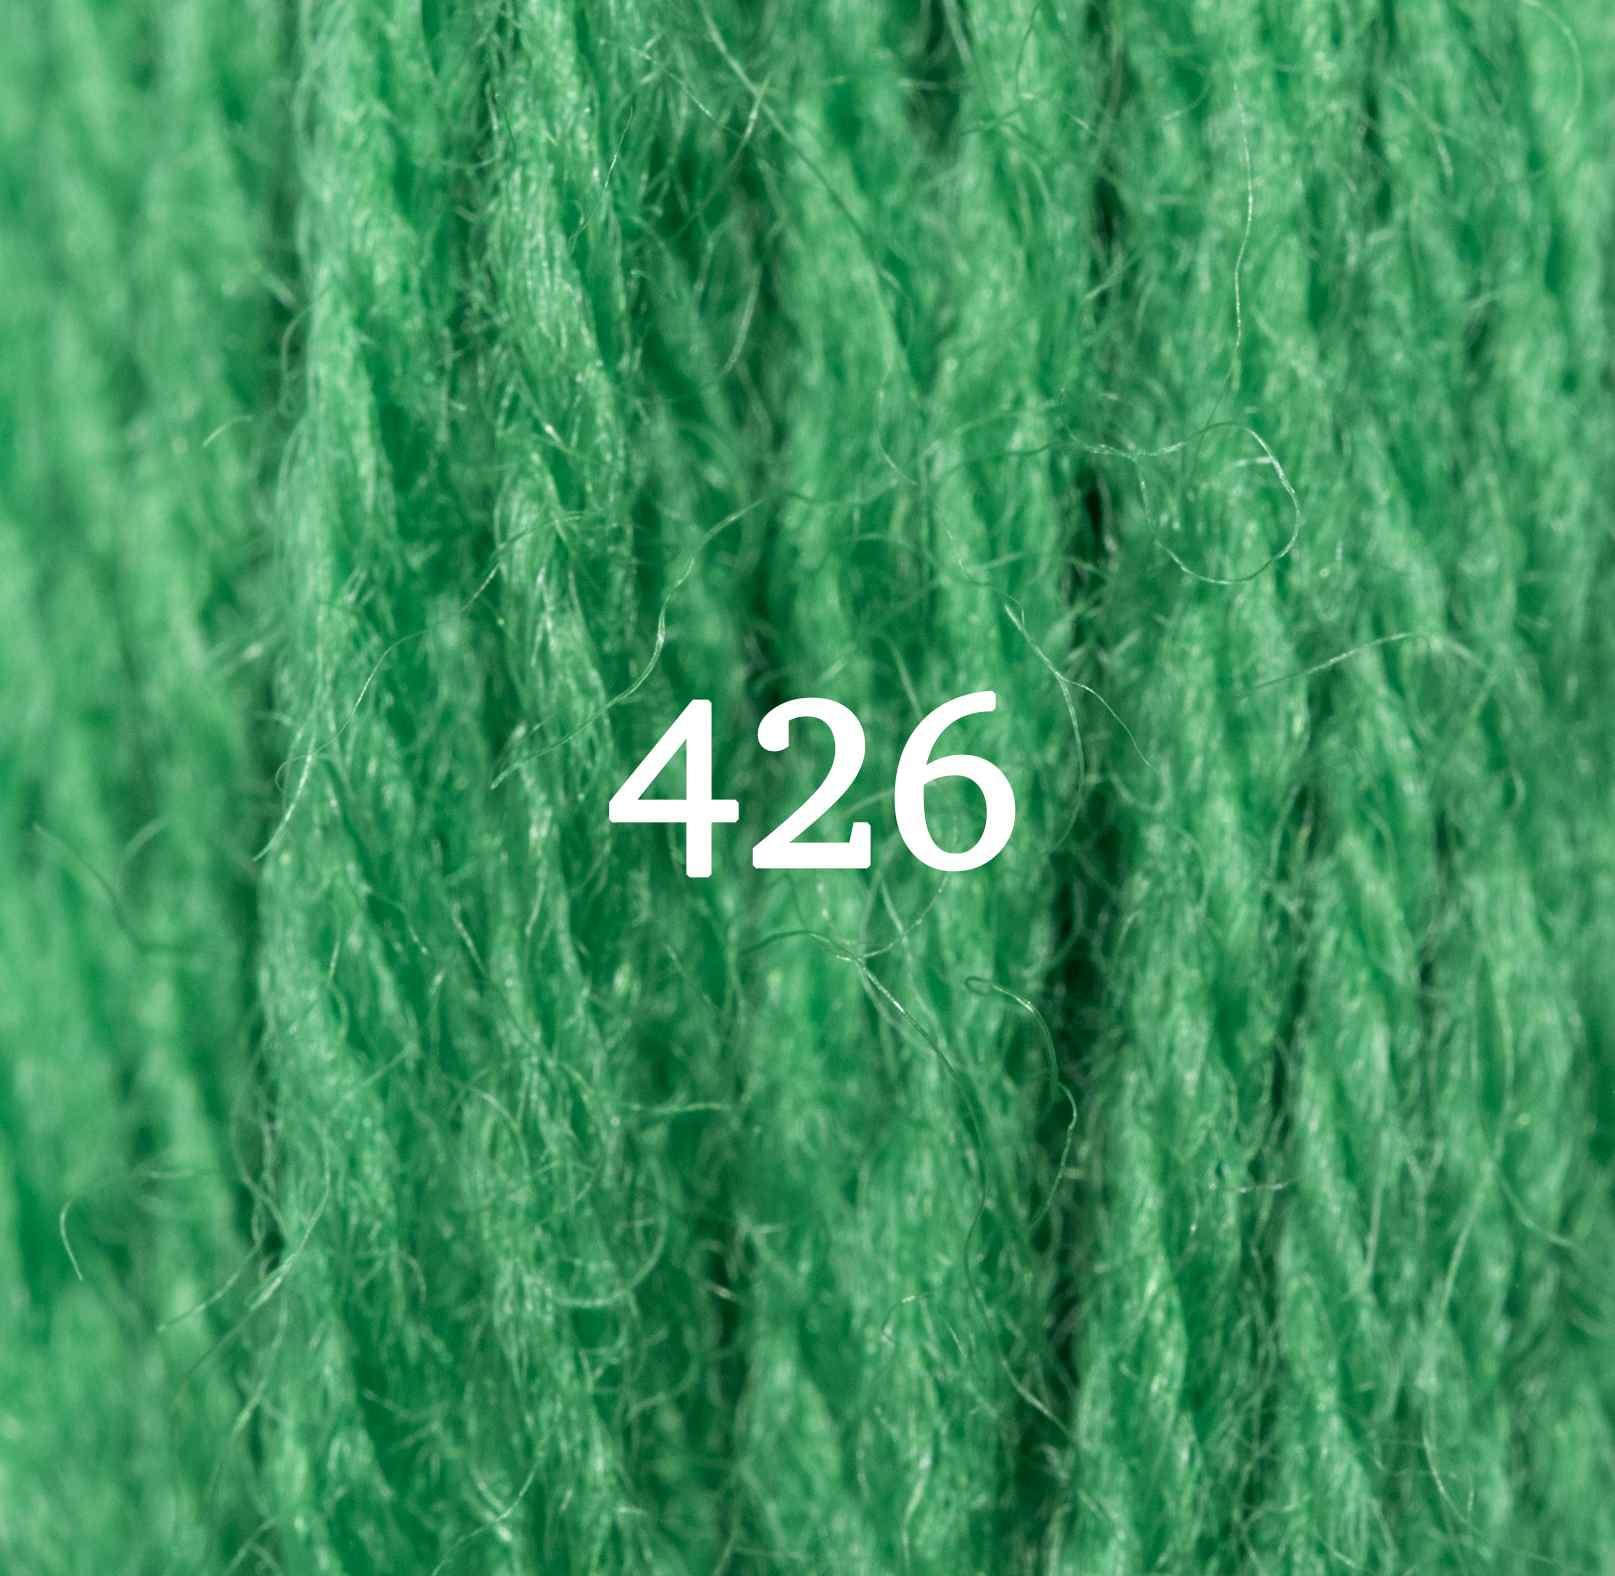 Leaf-Green-426